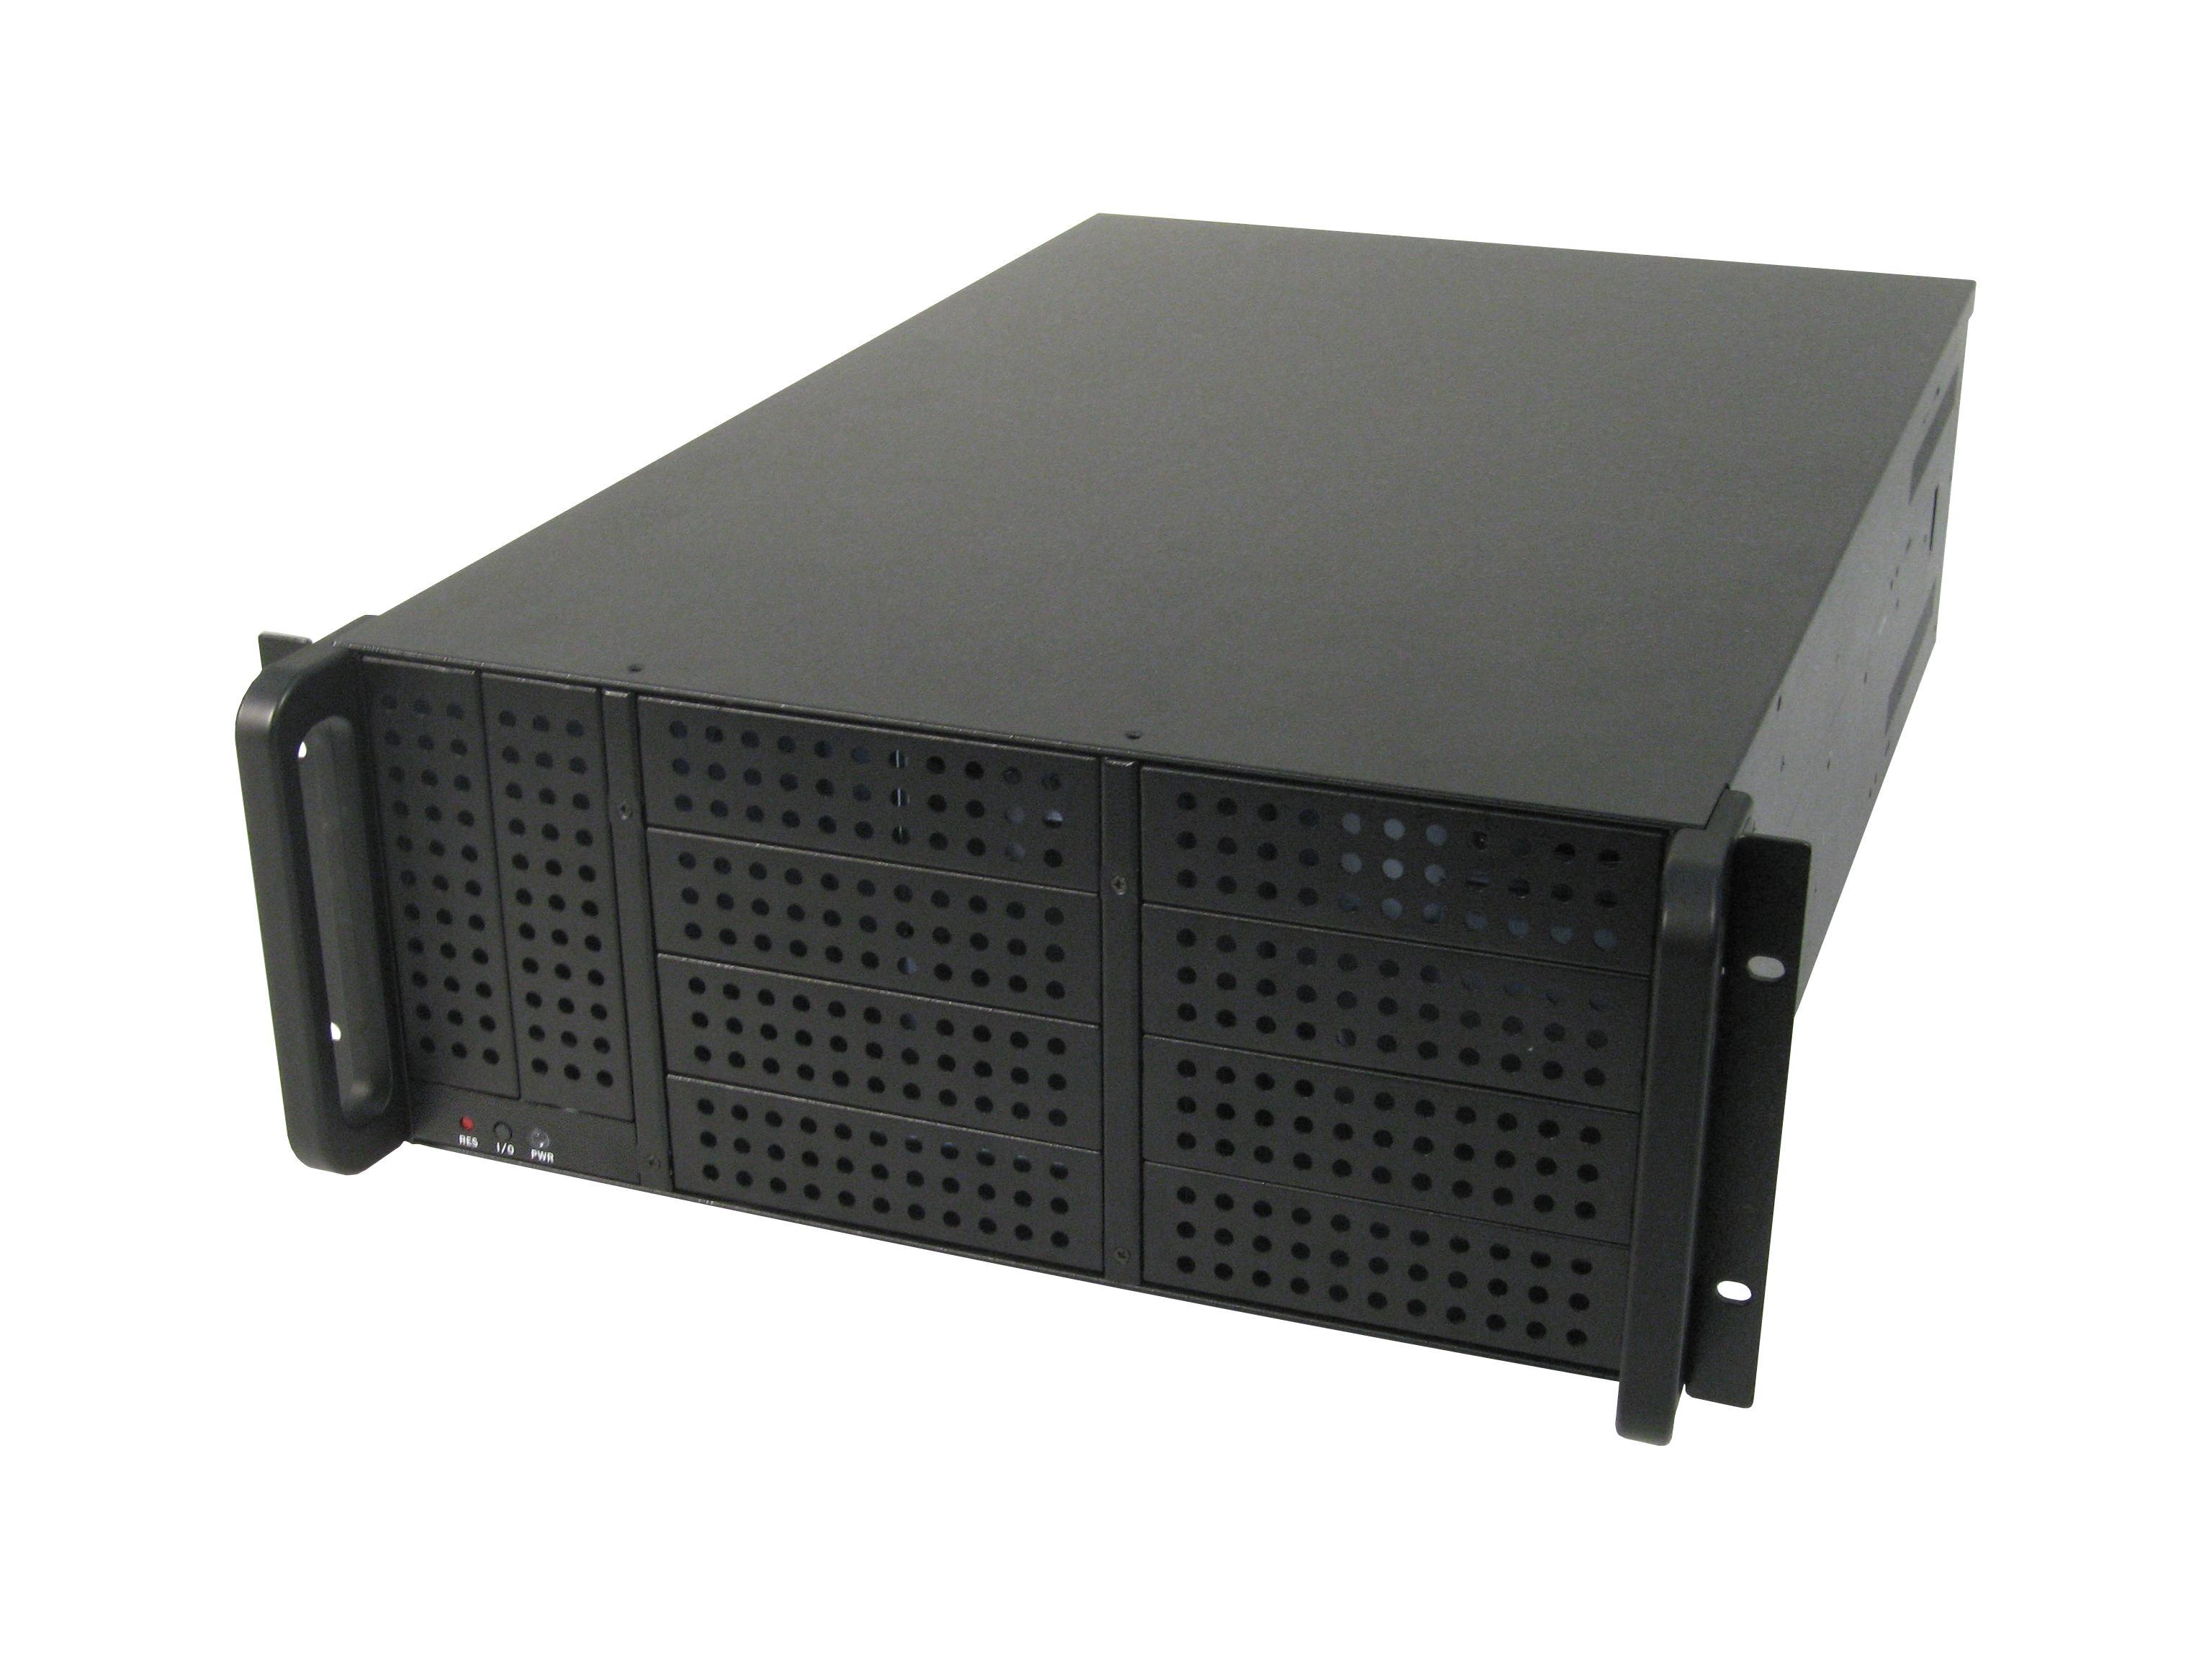 2022274-Chieftec-UNC-410F-B-OP-vane-portacomputer-Mini-Tower-Nero-4U-UNC-410F-B